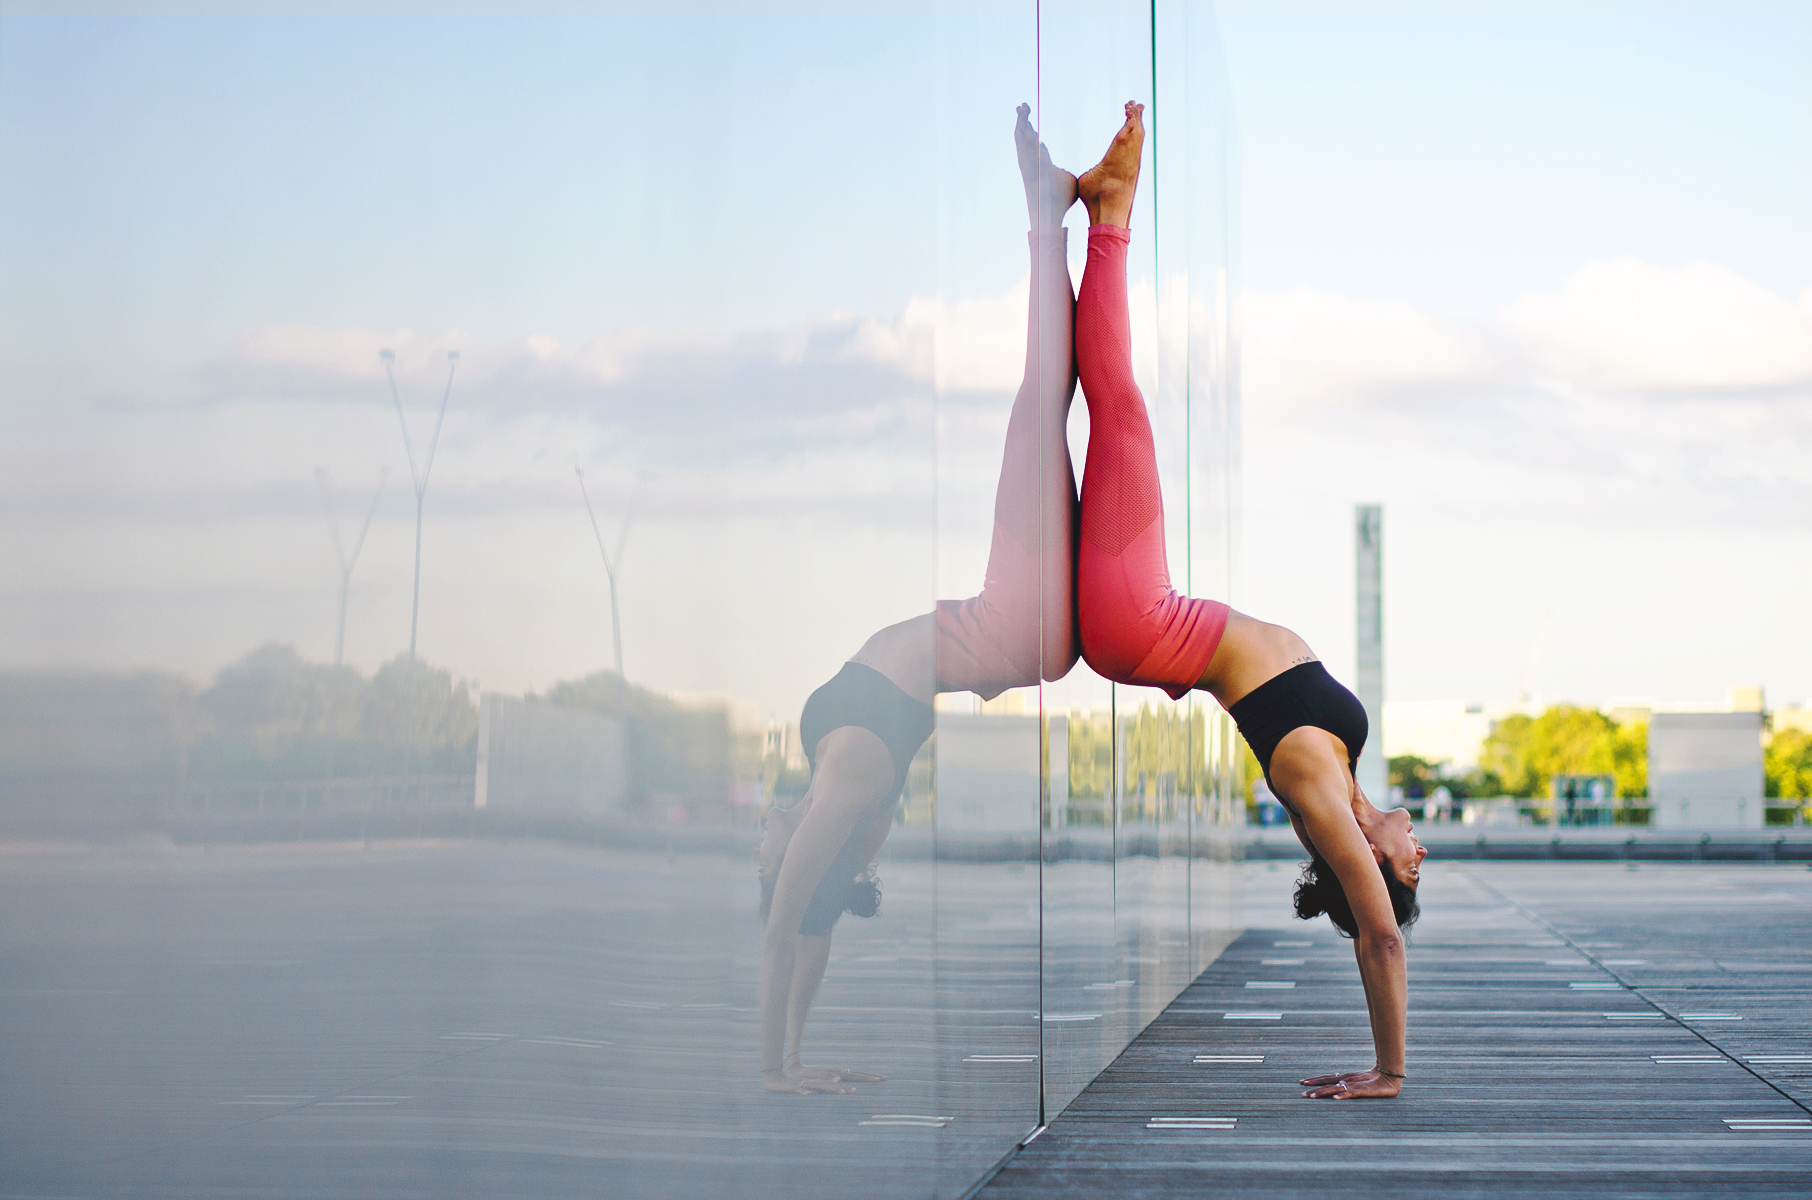 Yoga photography cathy le thanh com